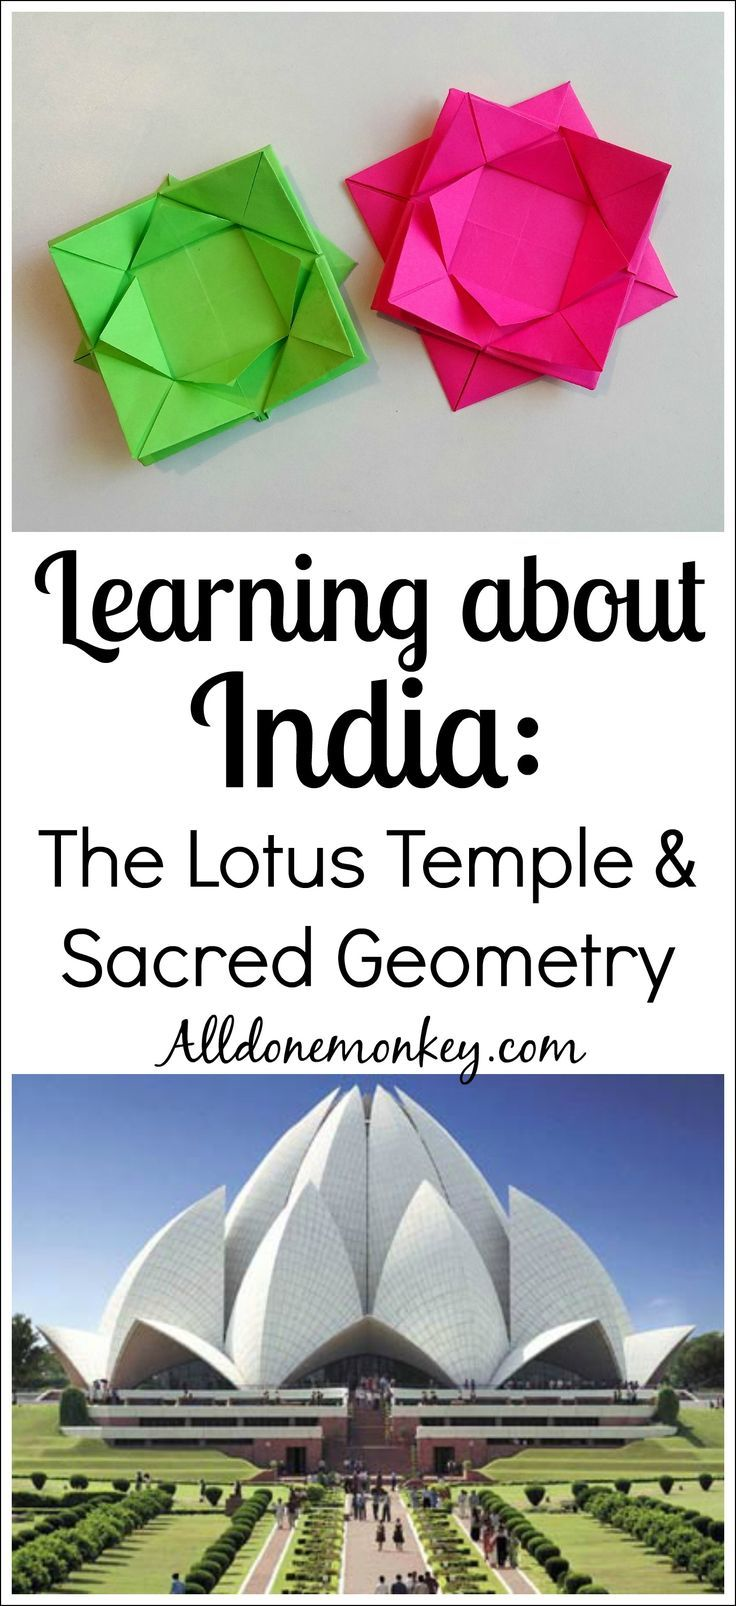 How To Make Origami Lotus Temple | Tutorial Origami Handmade